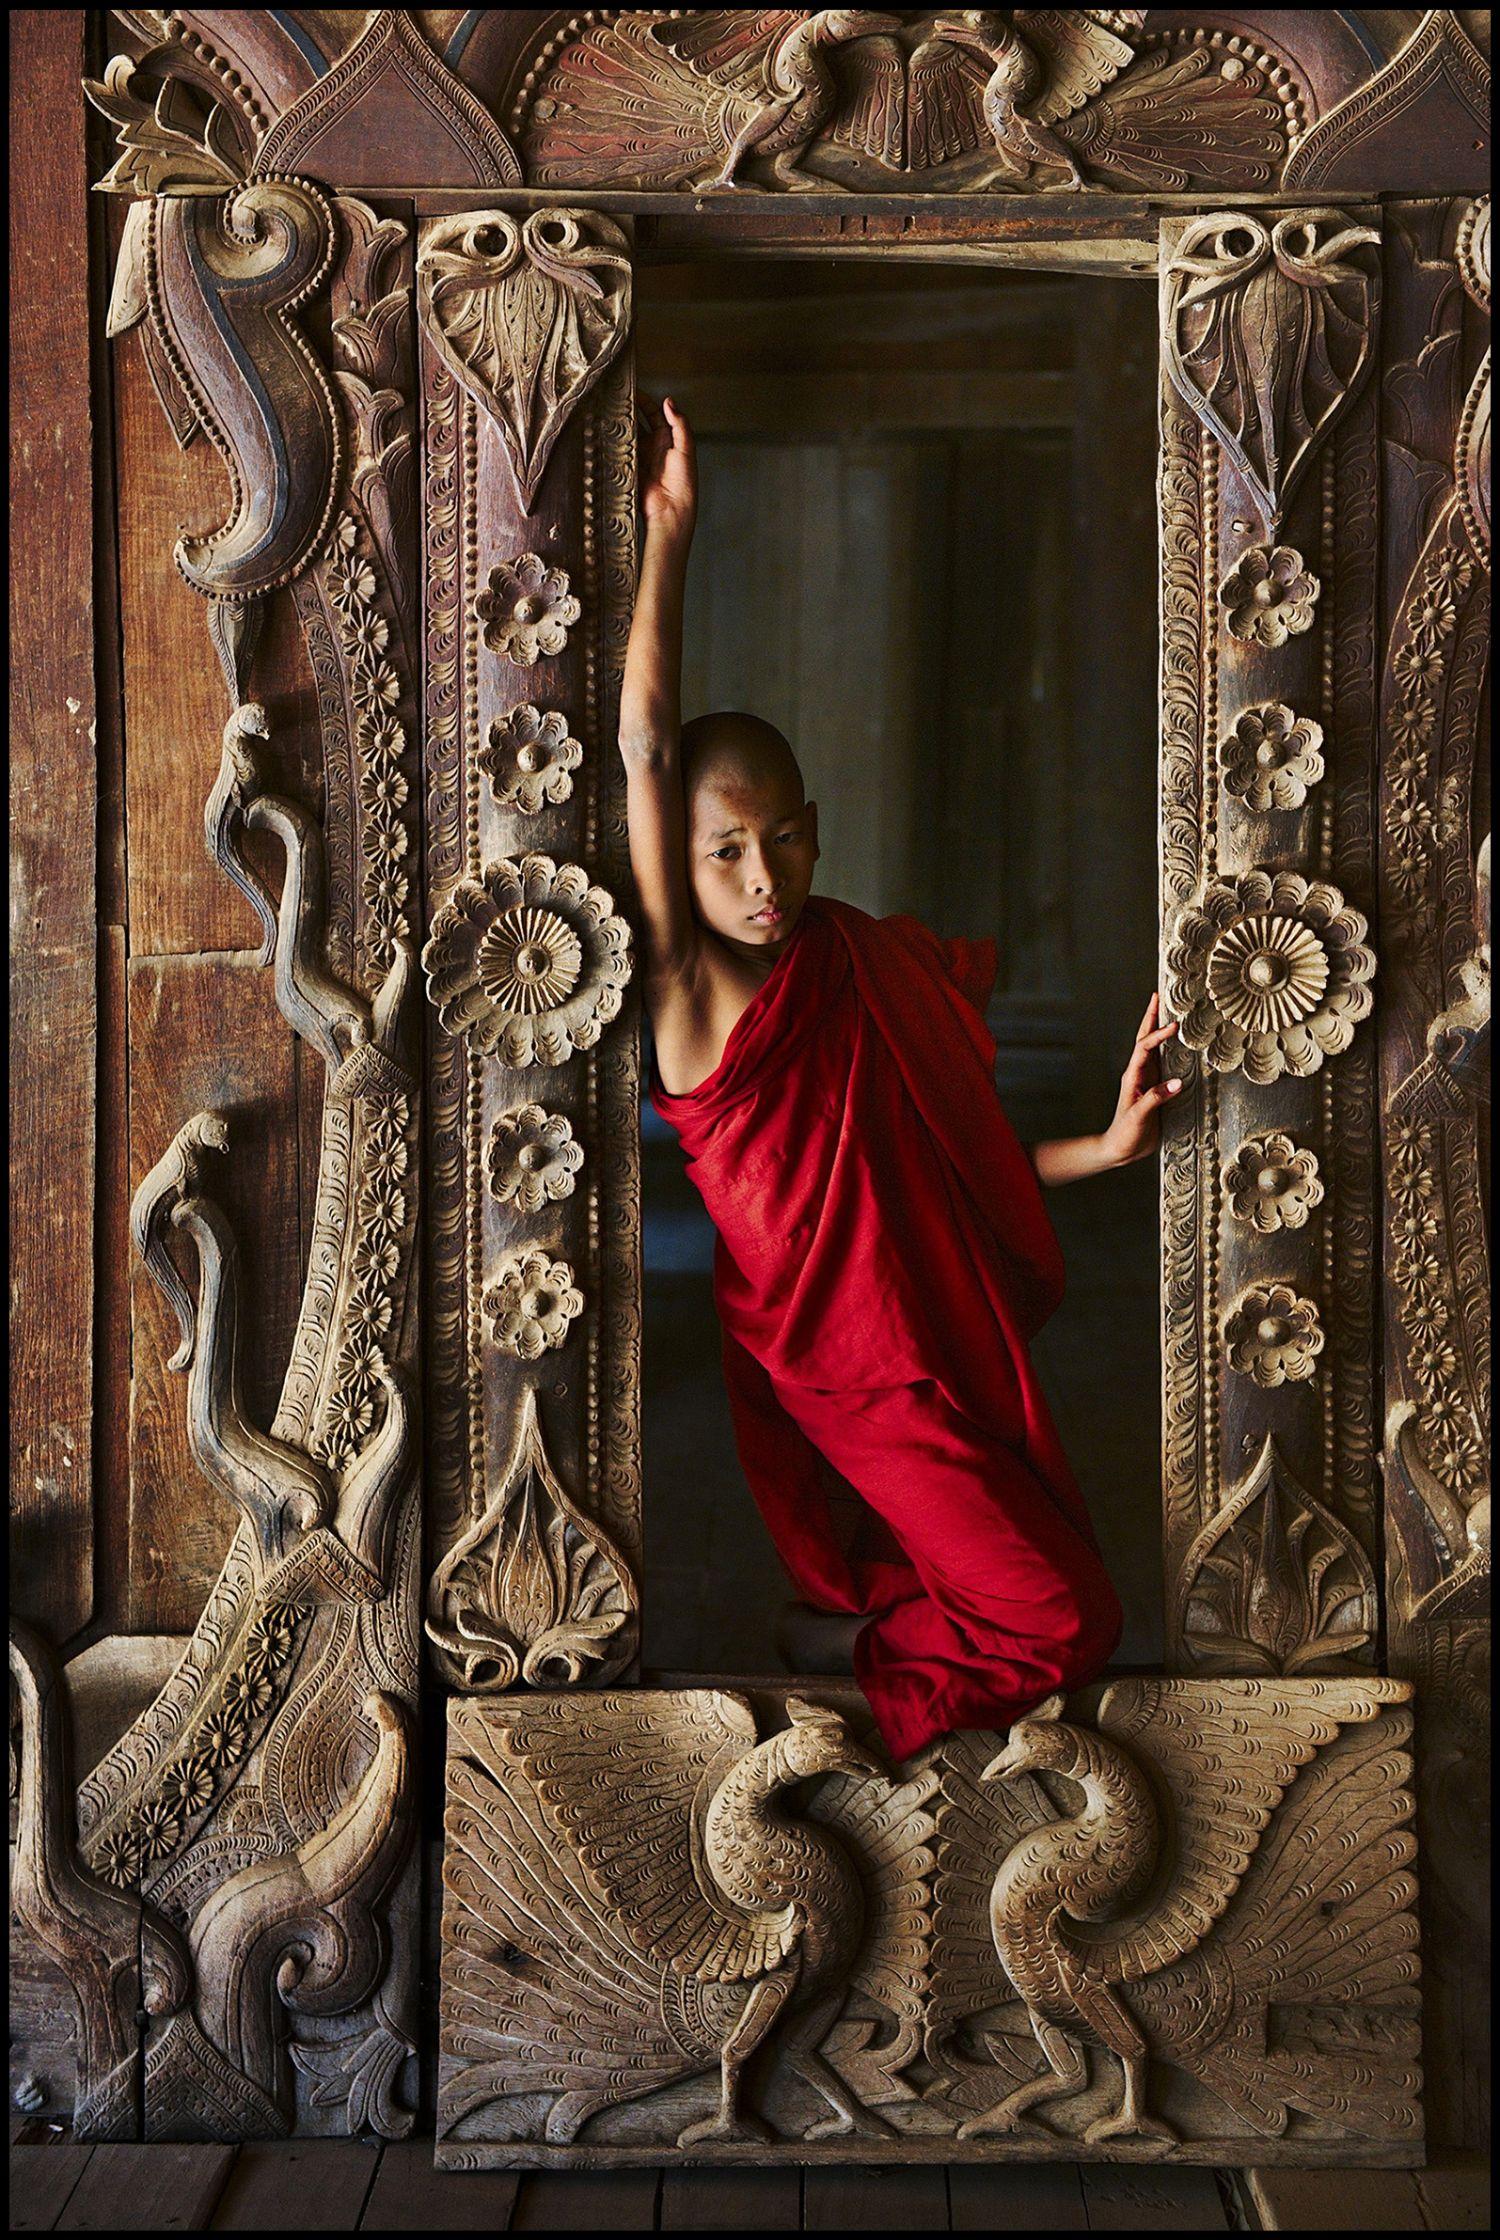 BURMA-10207, Burma, 2010